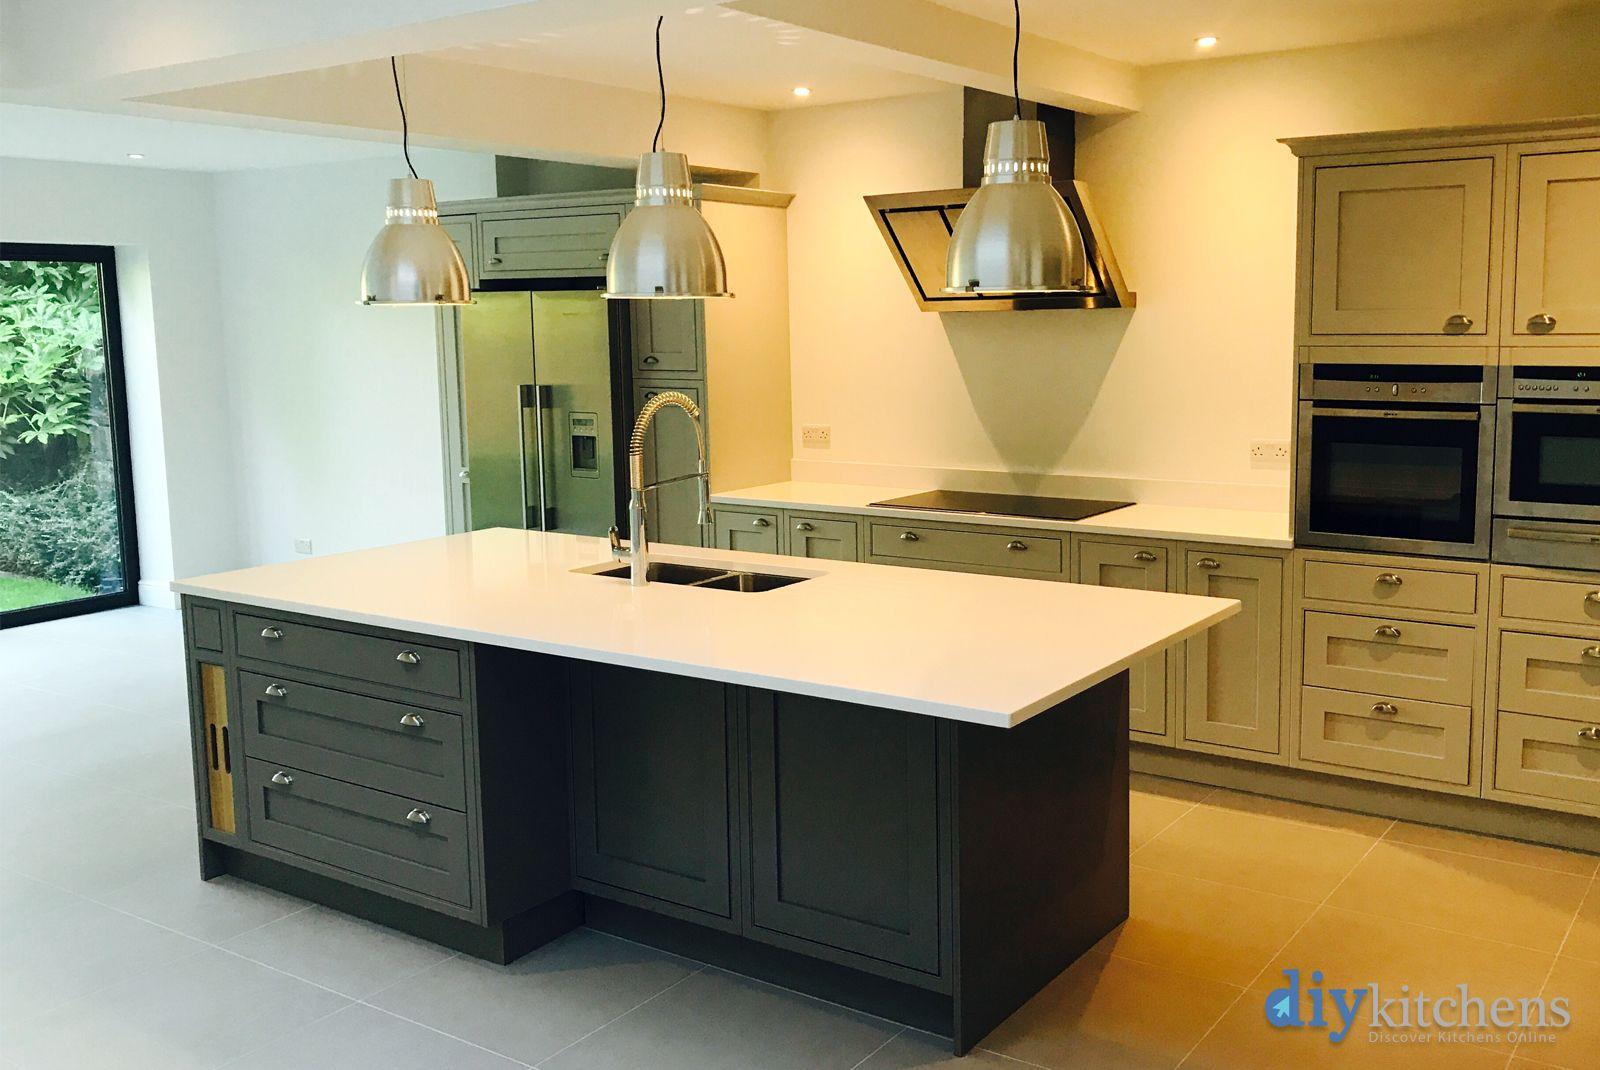 An Innova Helmsley Bespoke Painted Inframe Kitchen Diy